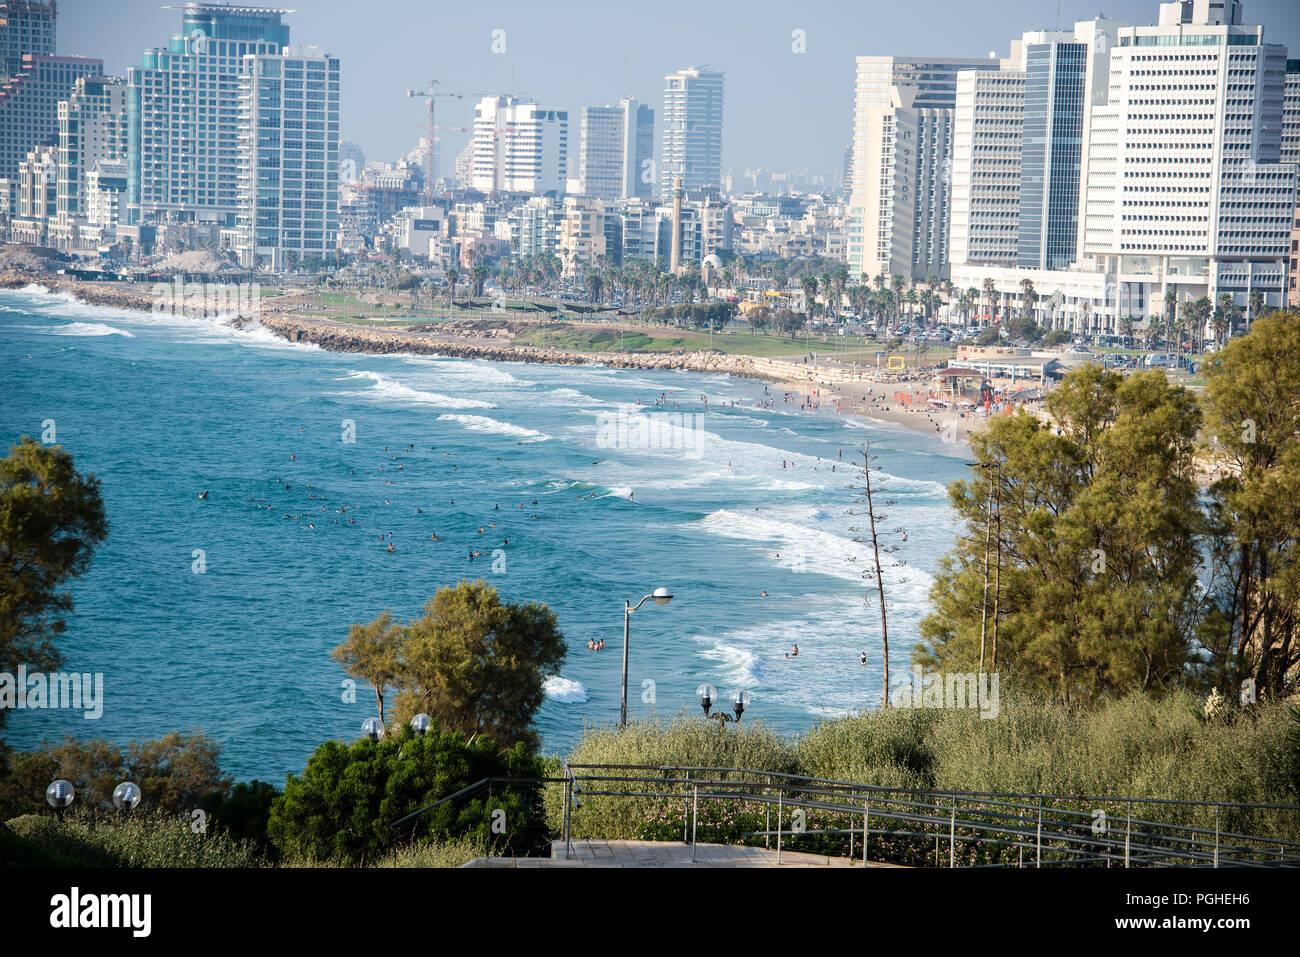 South Beach at Tel Aviv, Israel - Stock Image